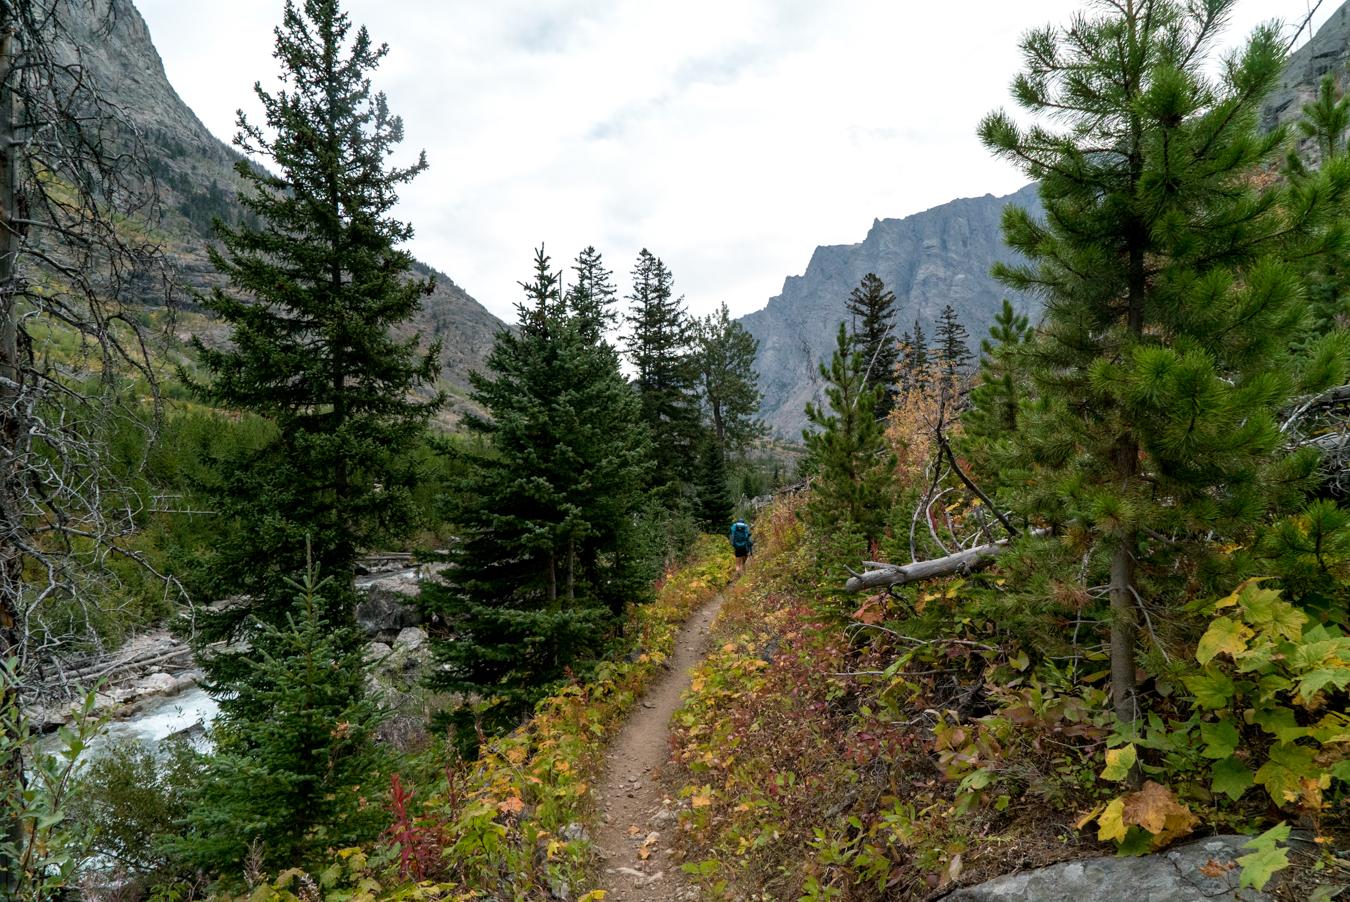 Final hike on the Beaten Path